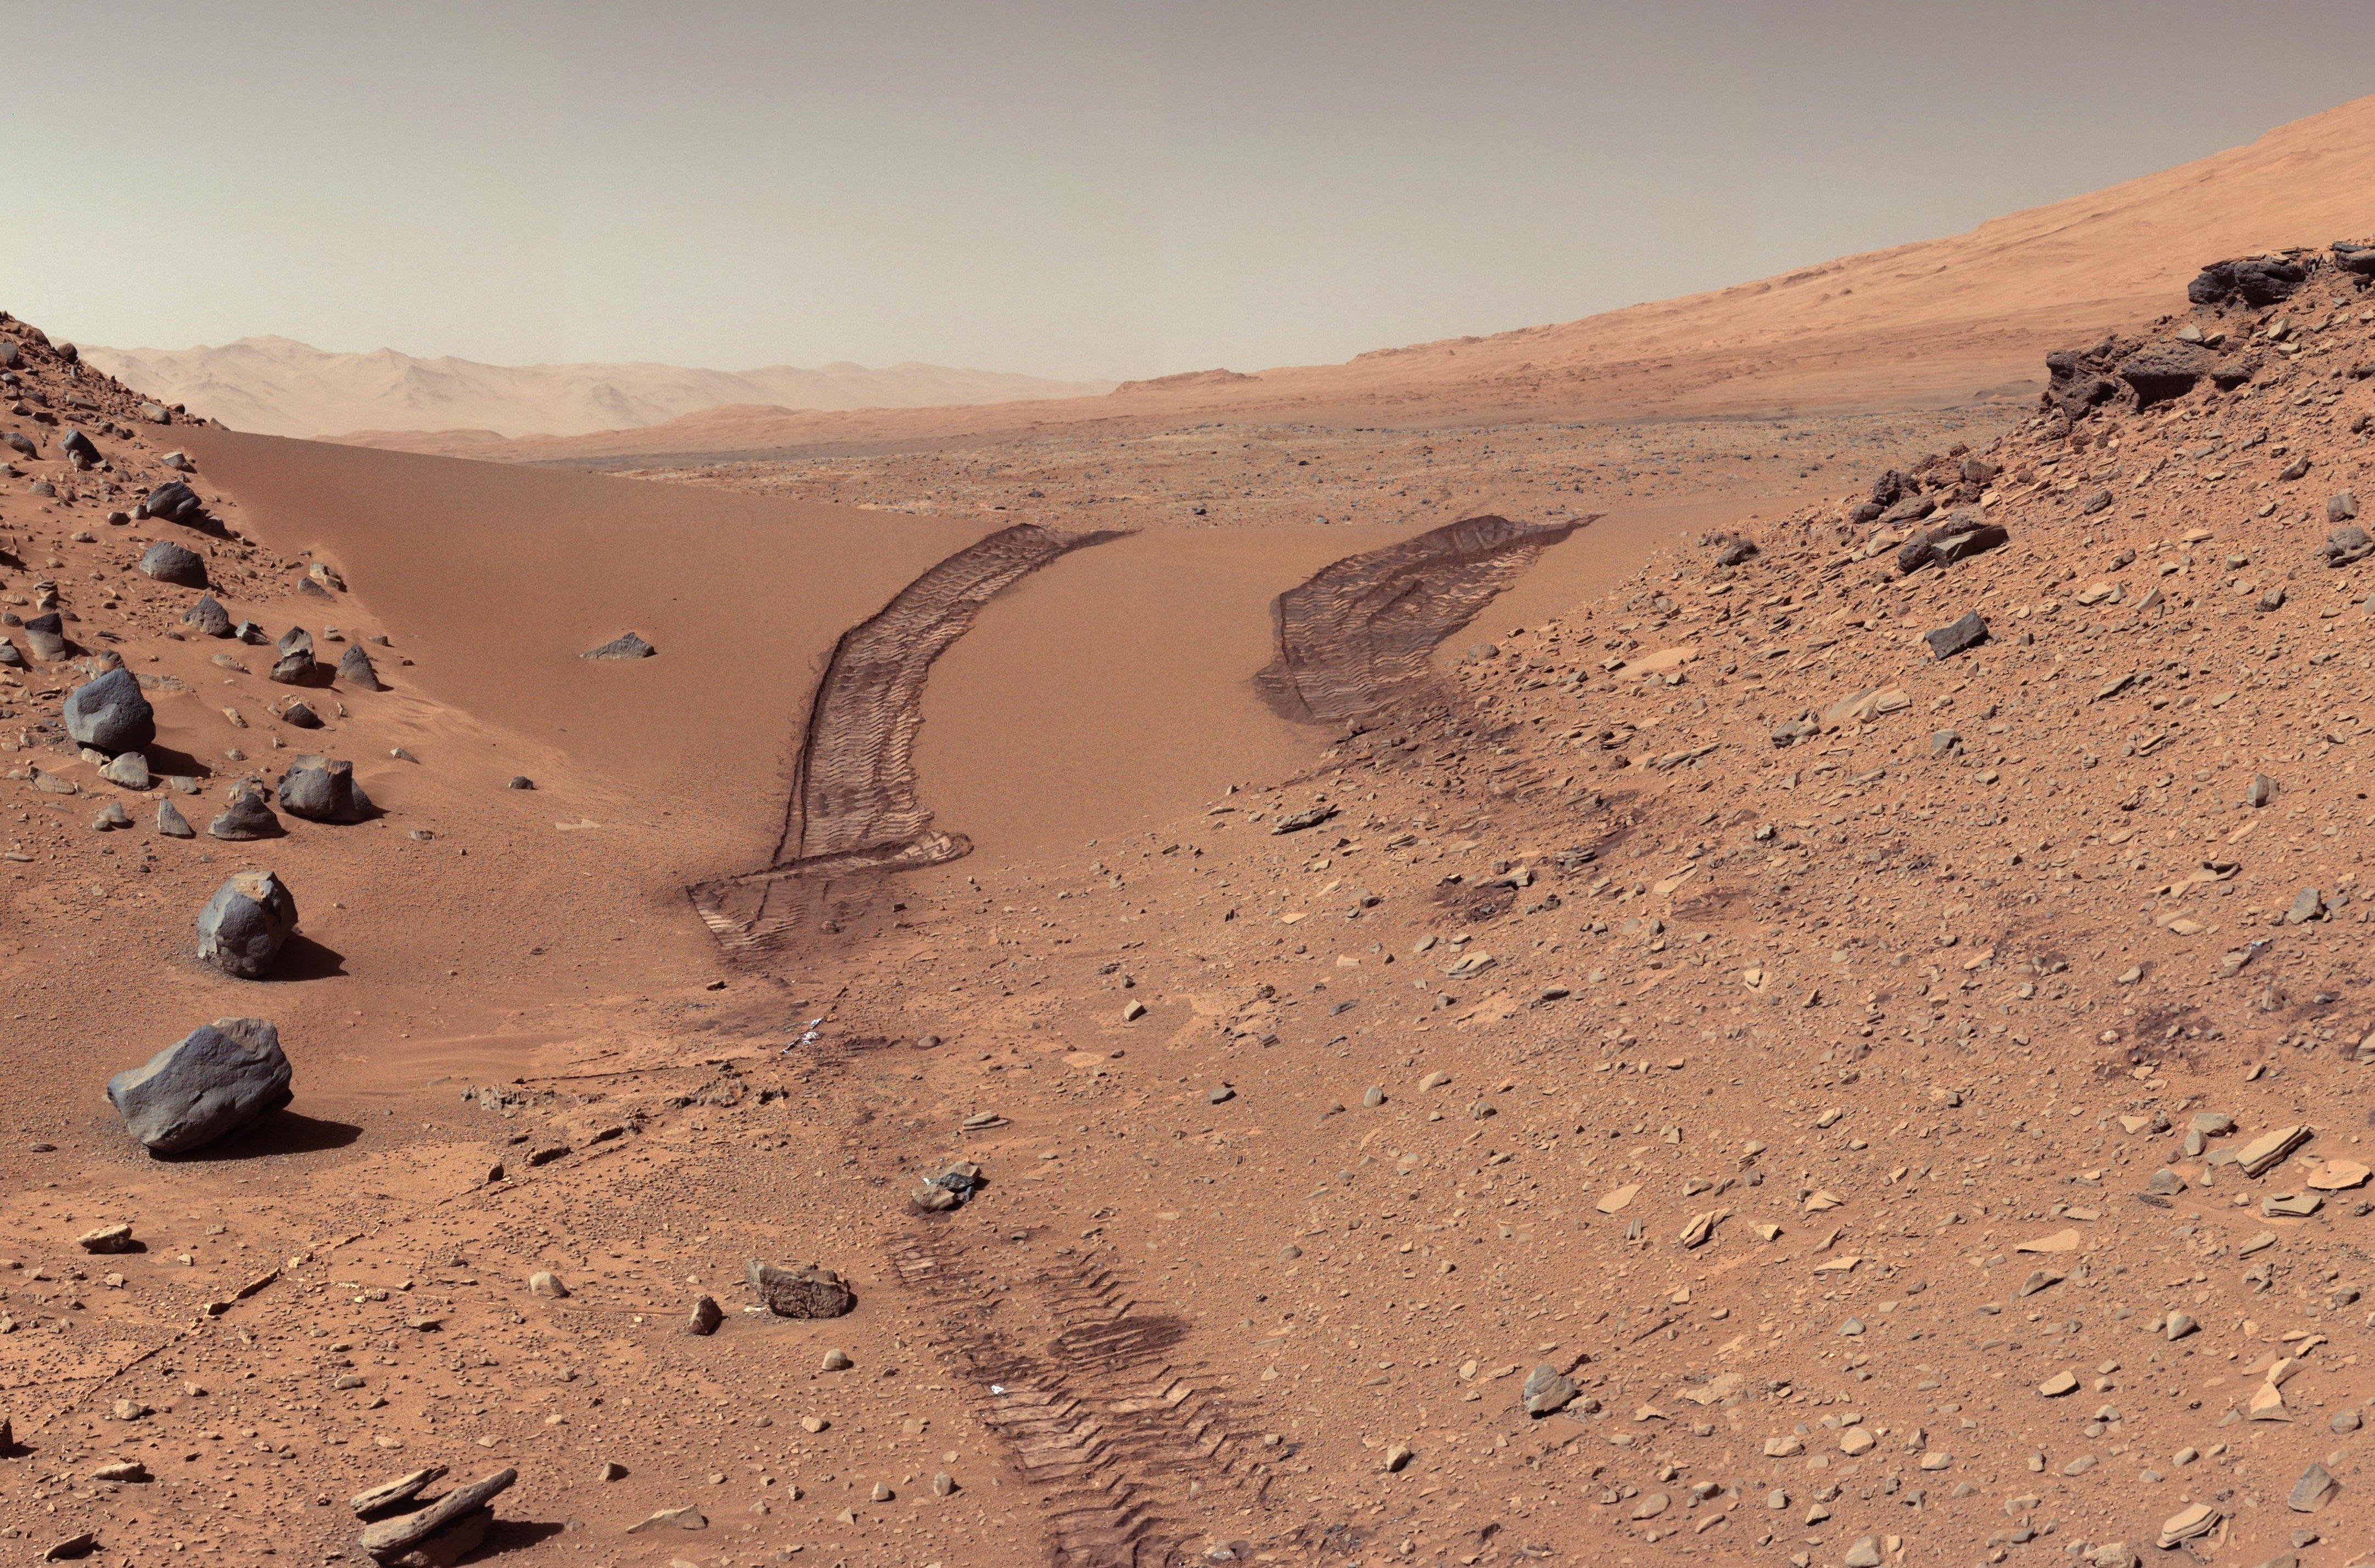 Martian soil - Wikipedia